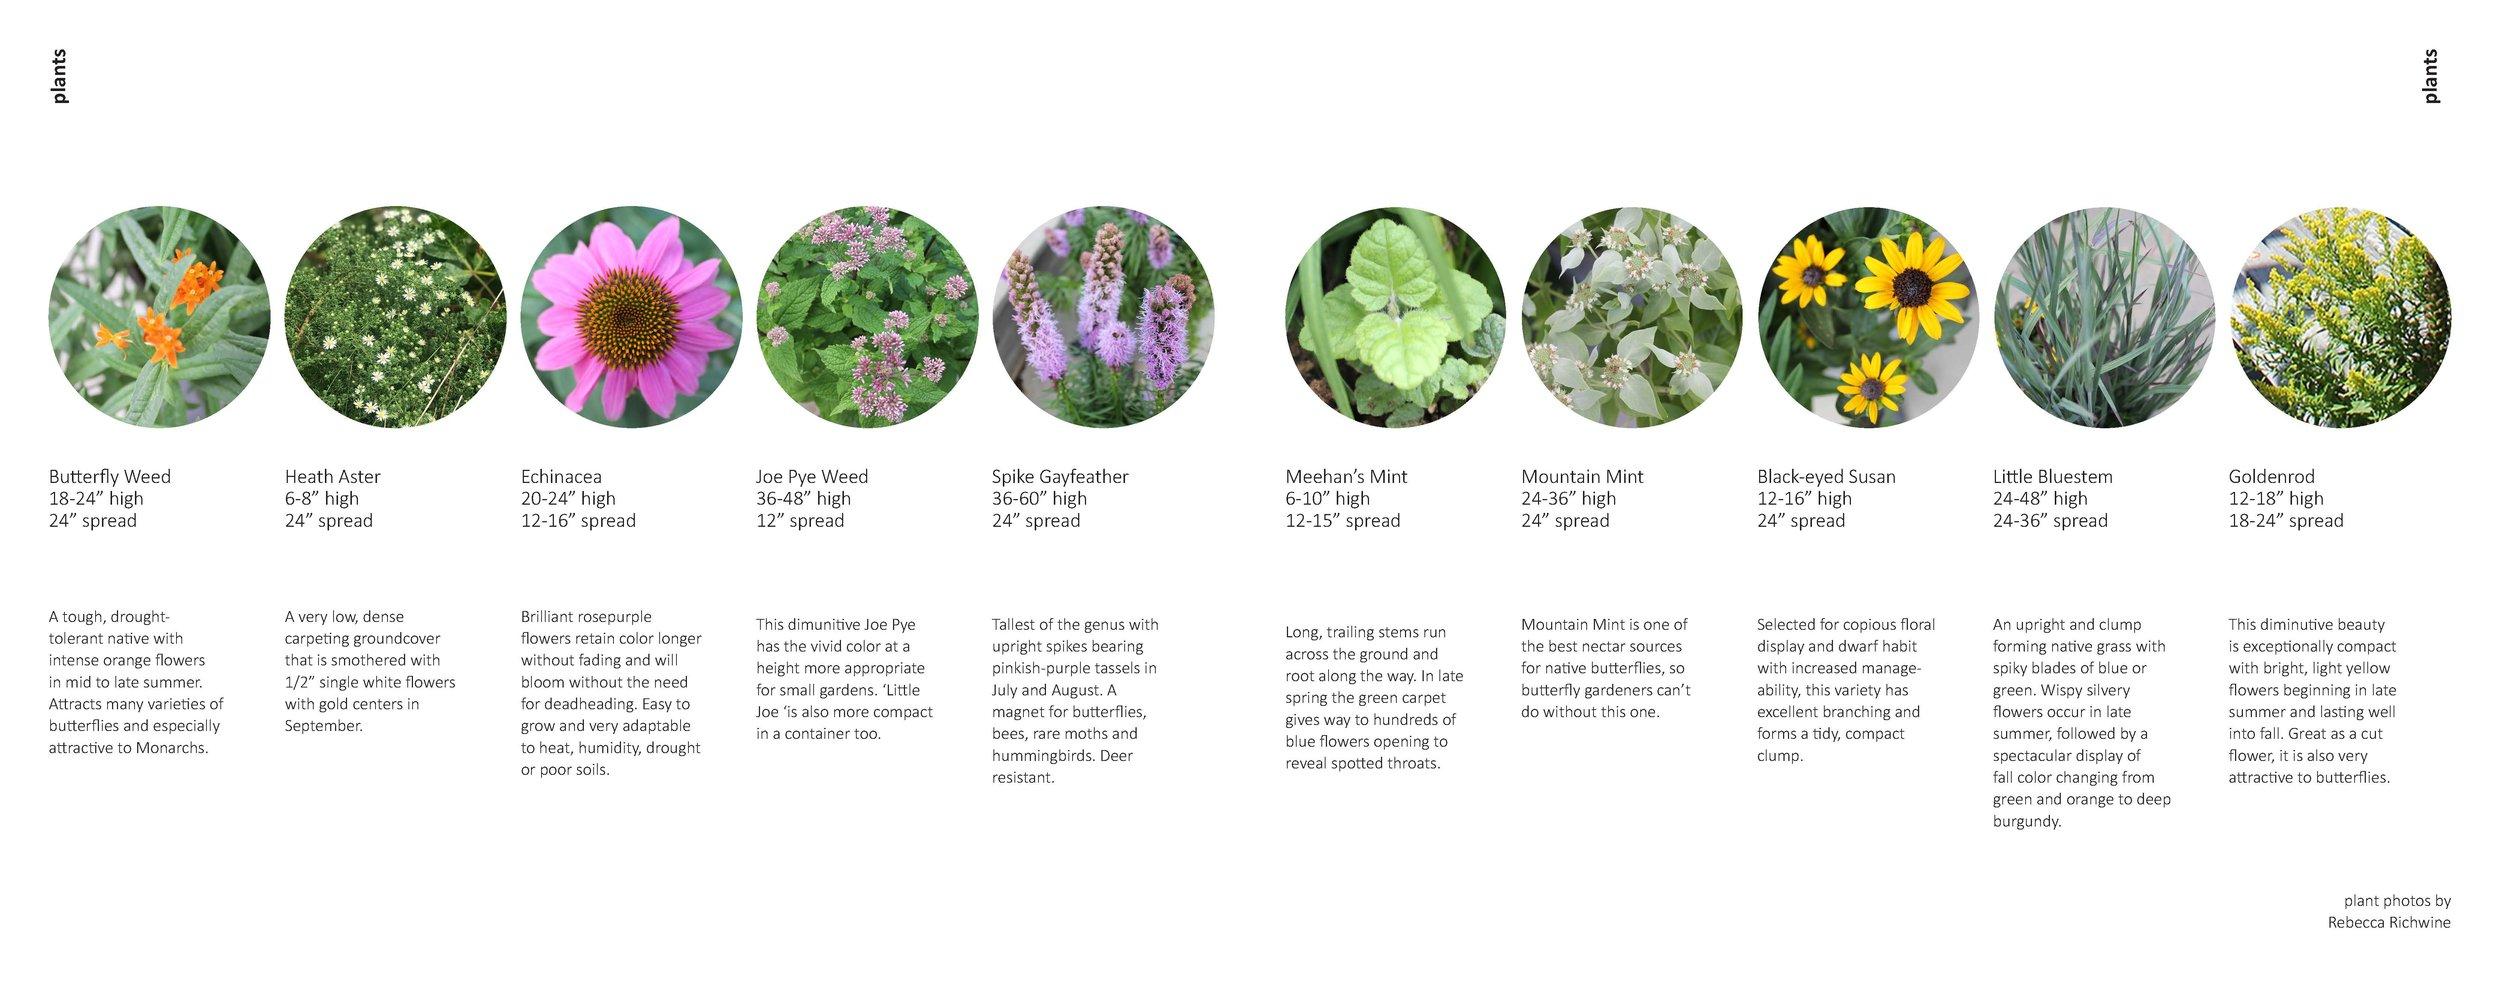 Plants in Pollinator Pots